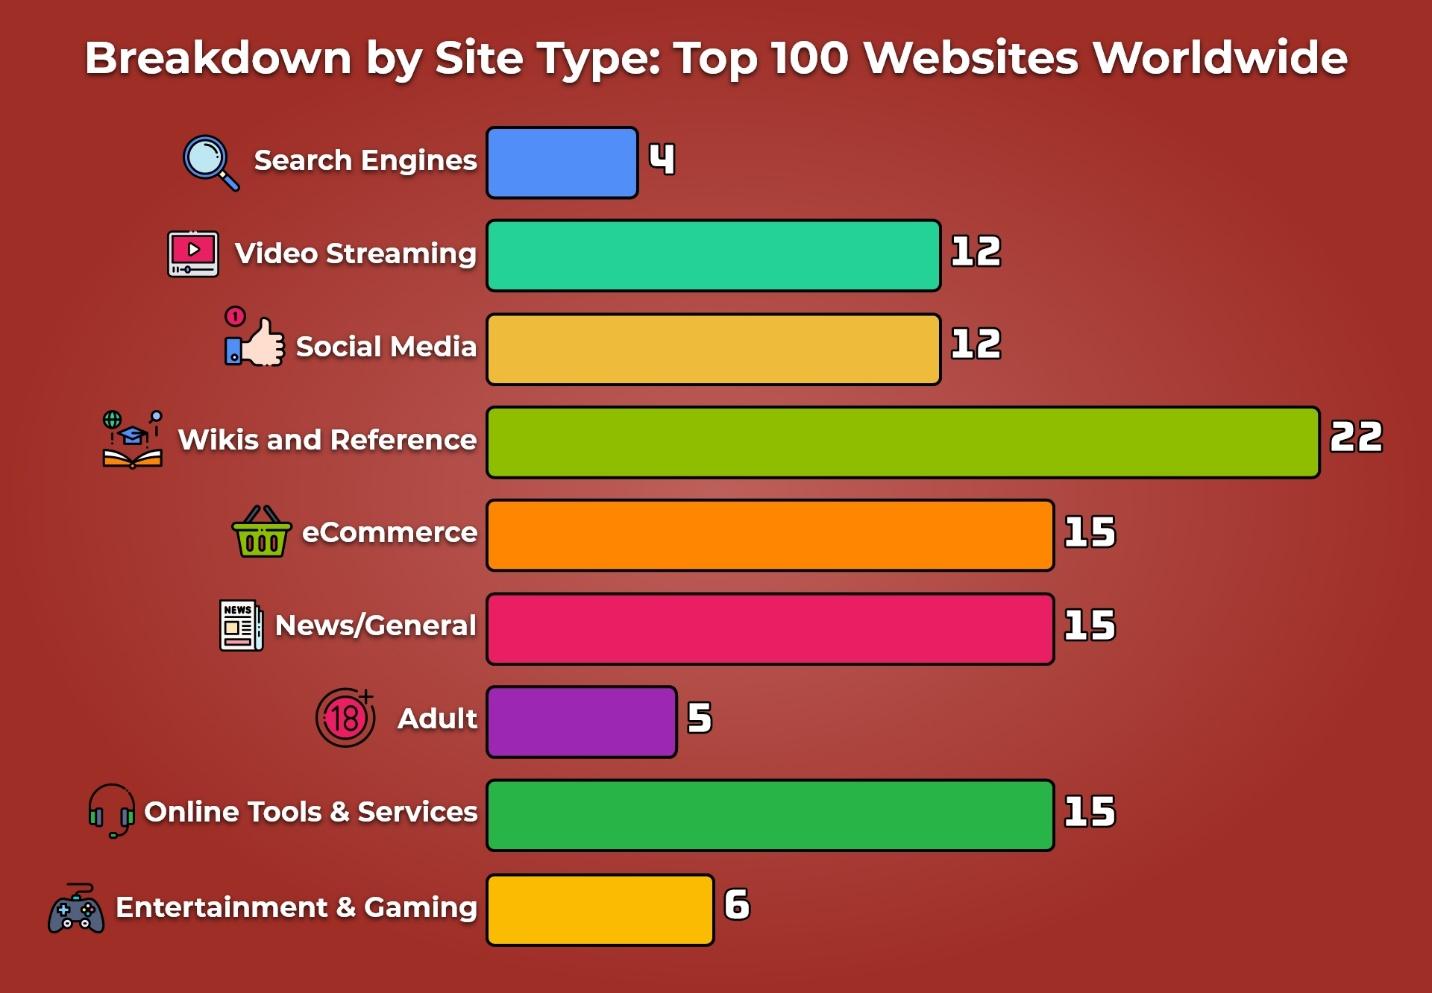 18 Breakdown by Site Type Top 100 Websites Worldwide